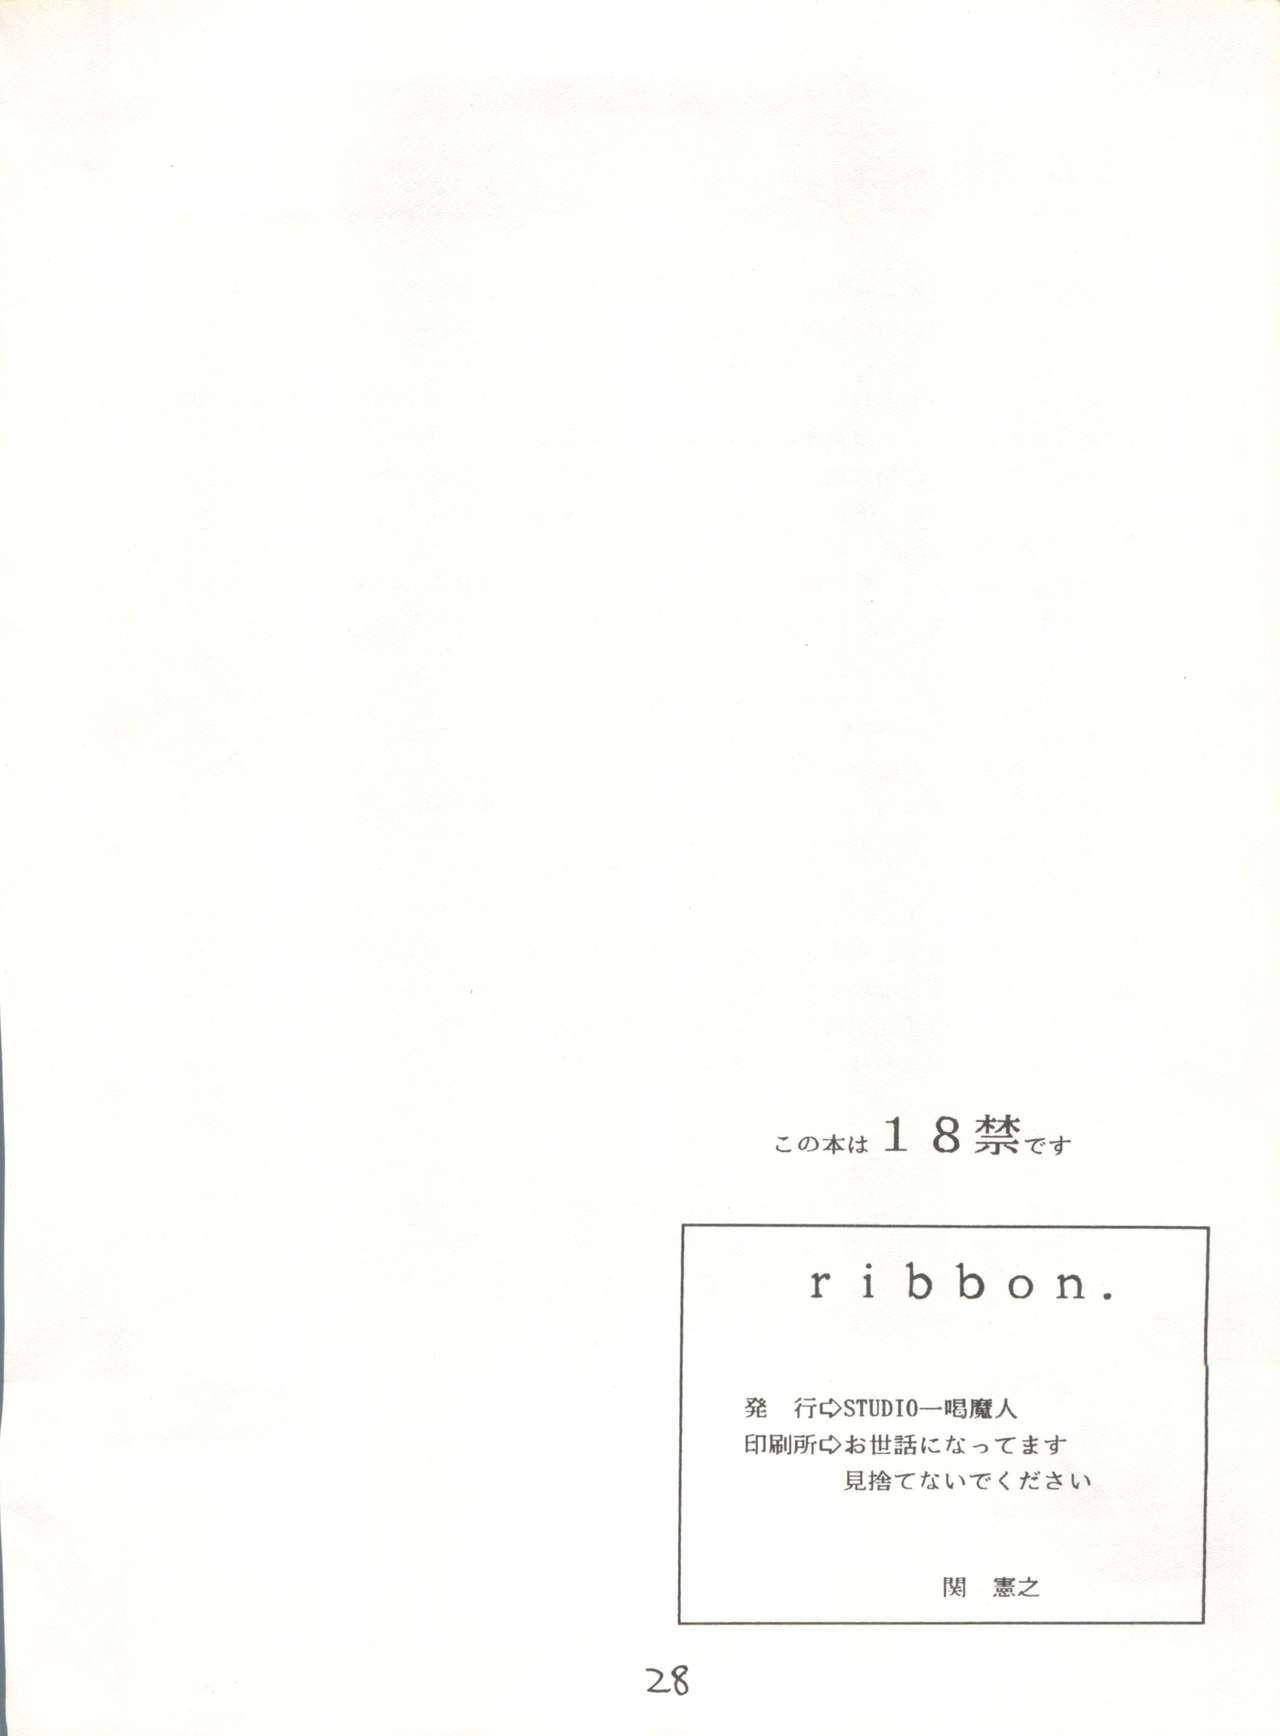 [Global One (MARO)] Sadistic 5 (Cutey Honey, Devilman, Sailor Moon), [Global One (MARO)] Sadistic (Dirty Pair, Fushigi no Umi no Nadia, Sailor Moon), [Studio Ikkatsumajin] .ribbon (Hime-chan's Ribbon) 151